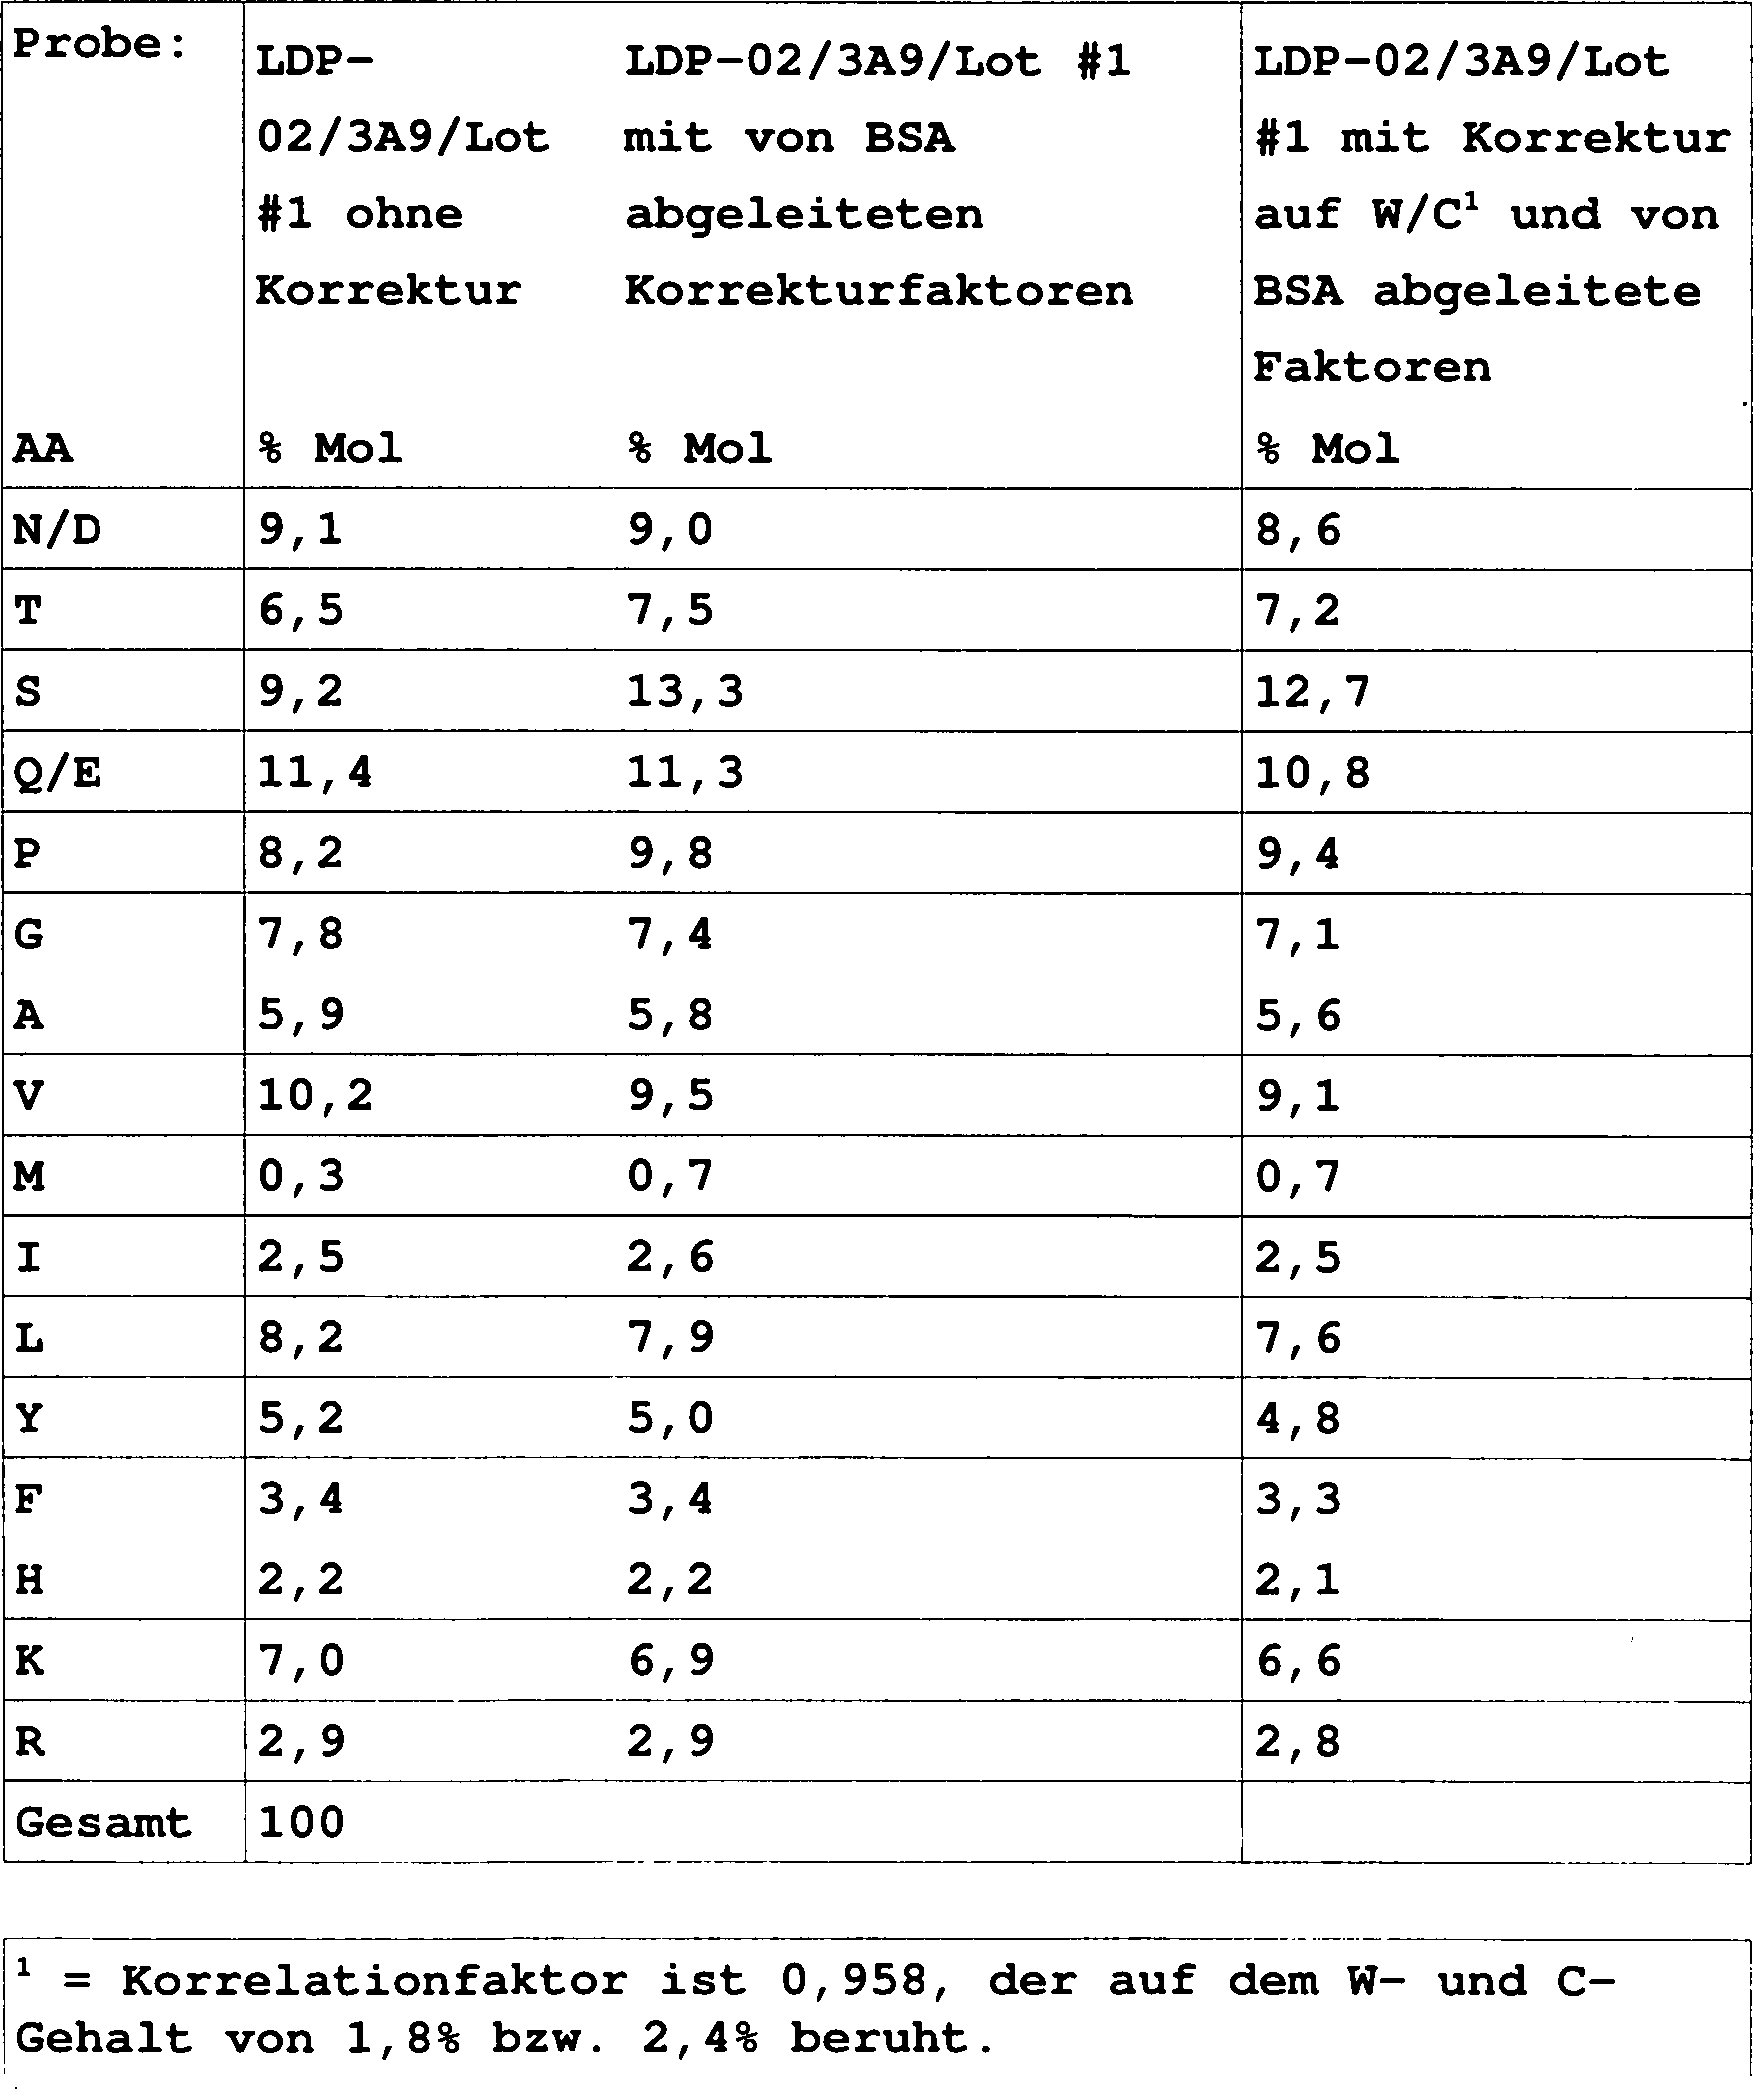 DE T3 Humanisiertes immunglobulin gegen den alpha4beta7